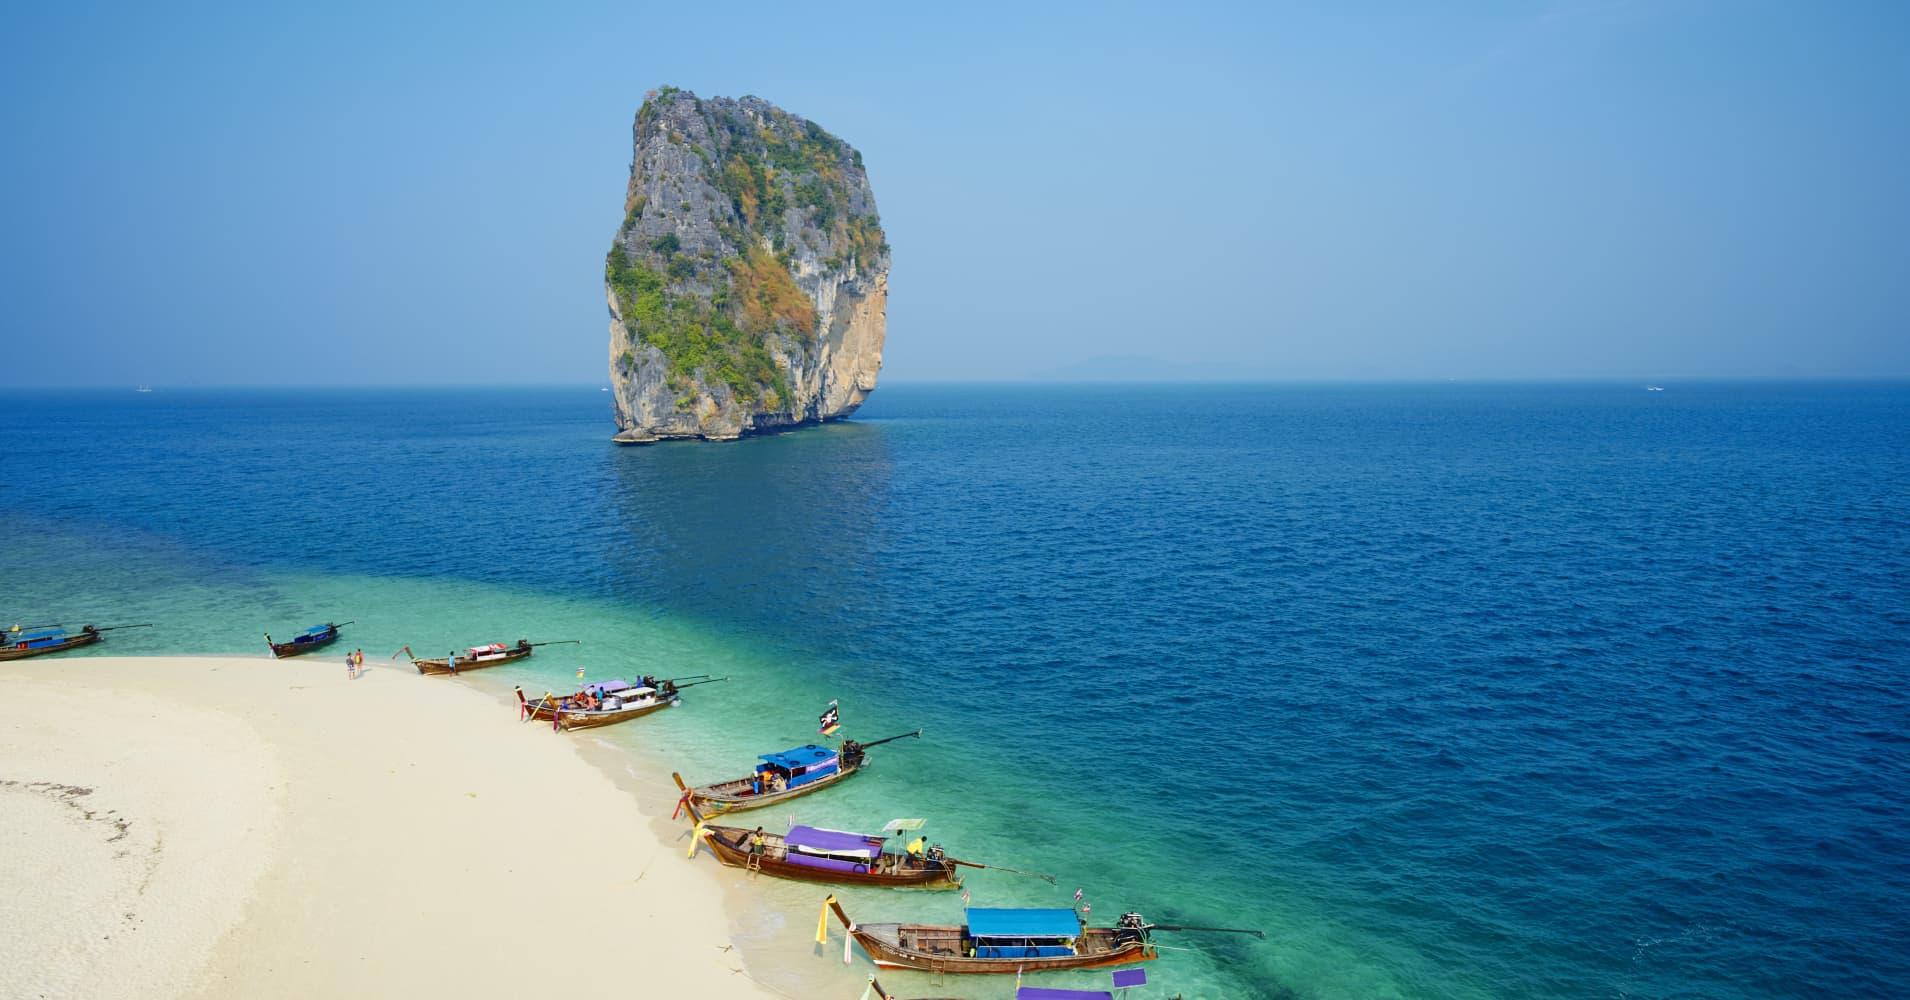 Kcs Third Quarter 2016 Bsea Commentary >> Famed Thai Island To Shut